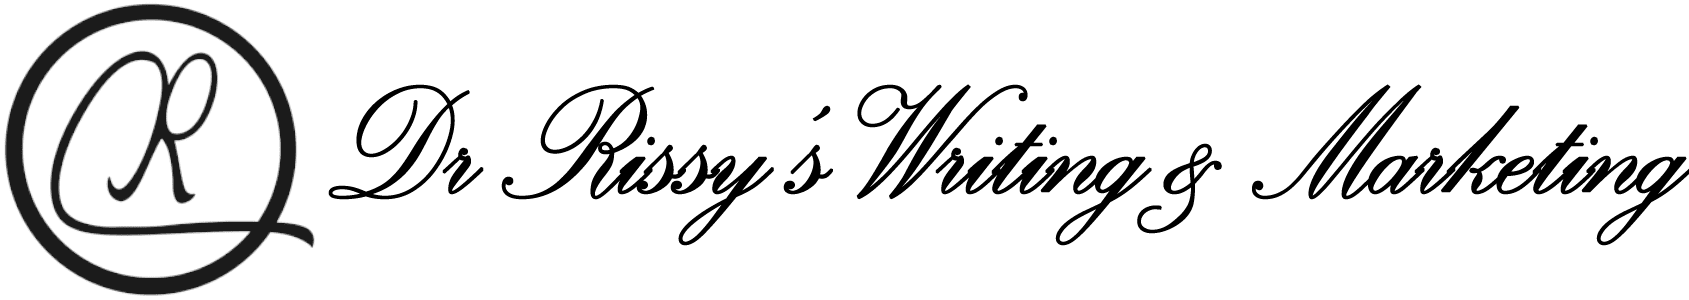 Dr Rissys Logo